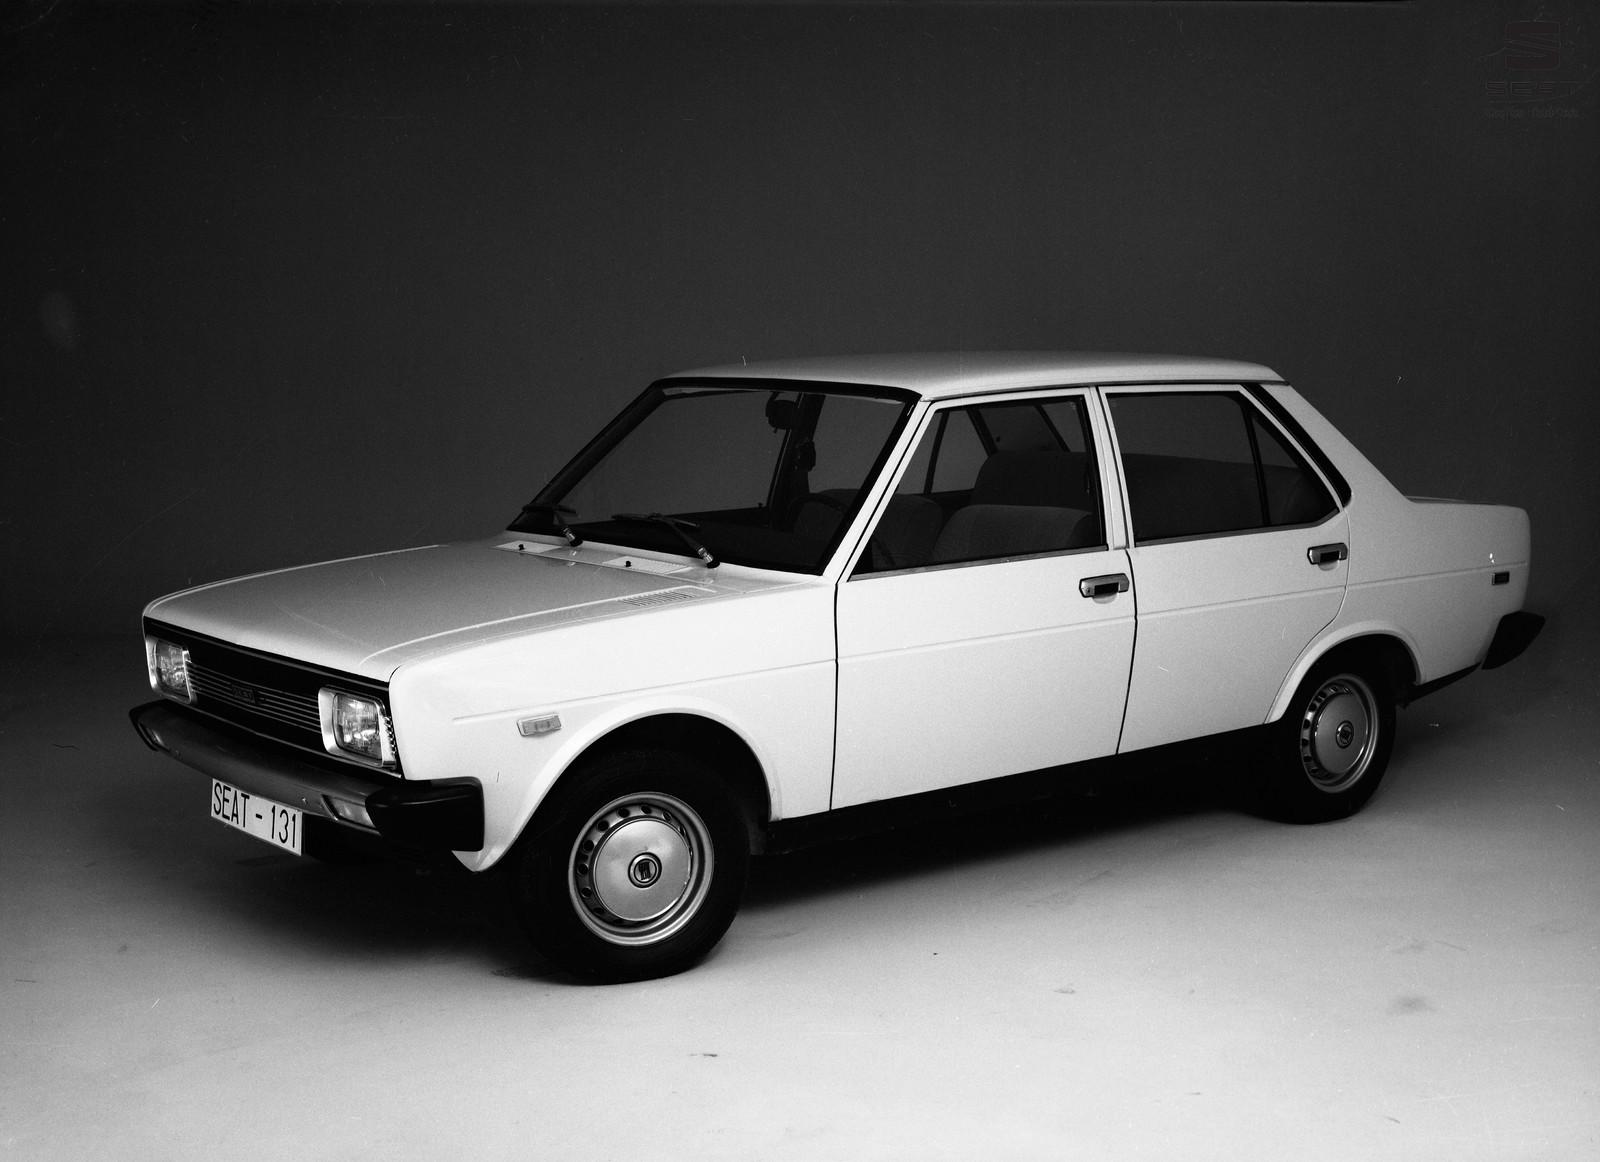 Foto de Motor SEAT 1430 - fotos históricas (22/49)